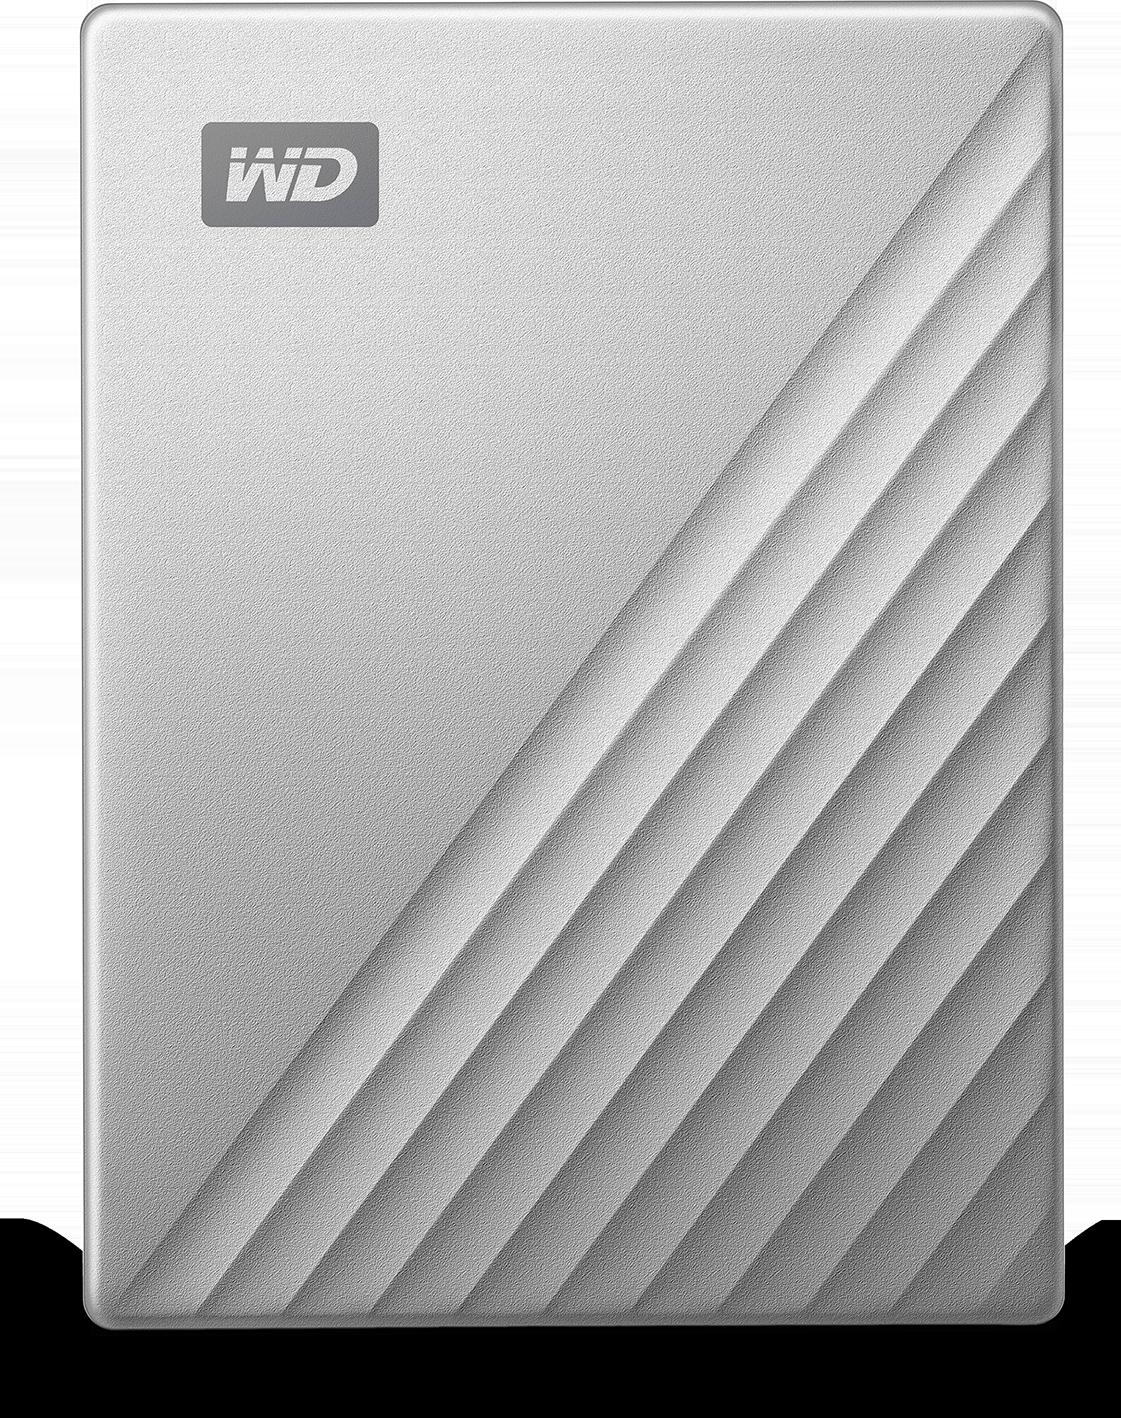 RE31DSZ?ver=8f6e - Western Digital My Passport Ultra Portable Hard Drive (Silver)